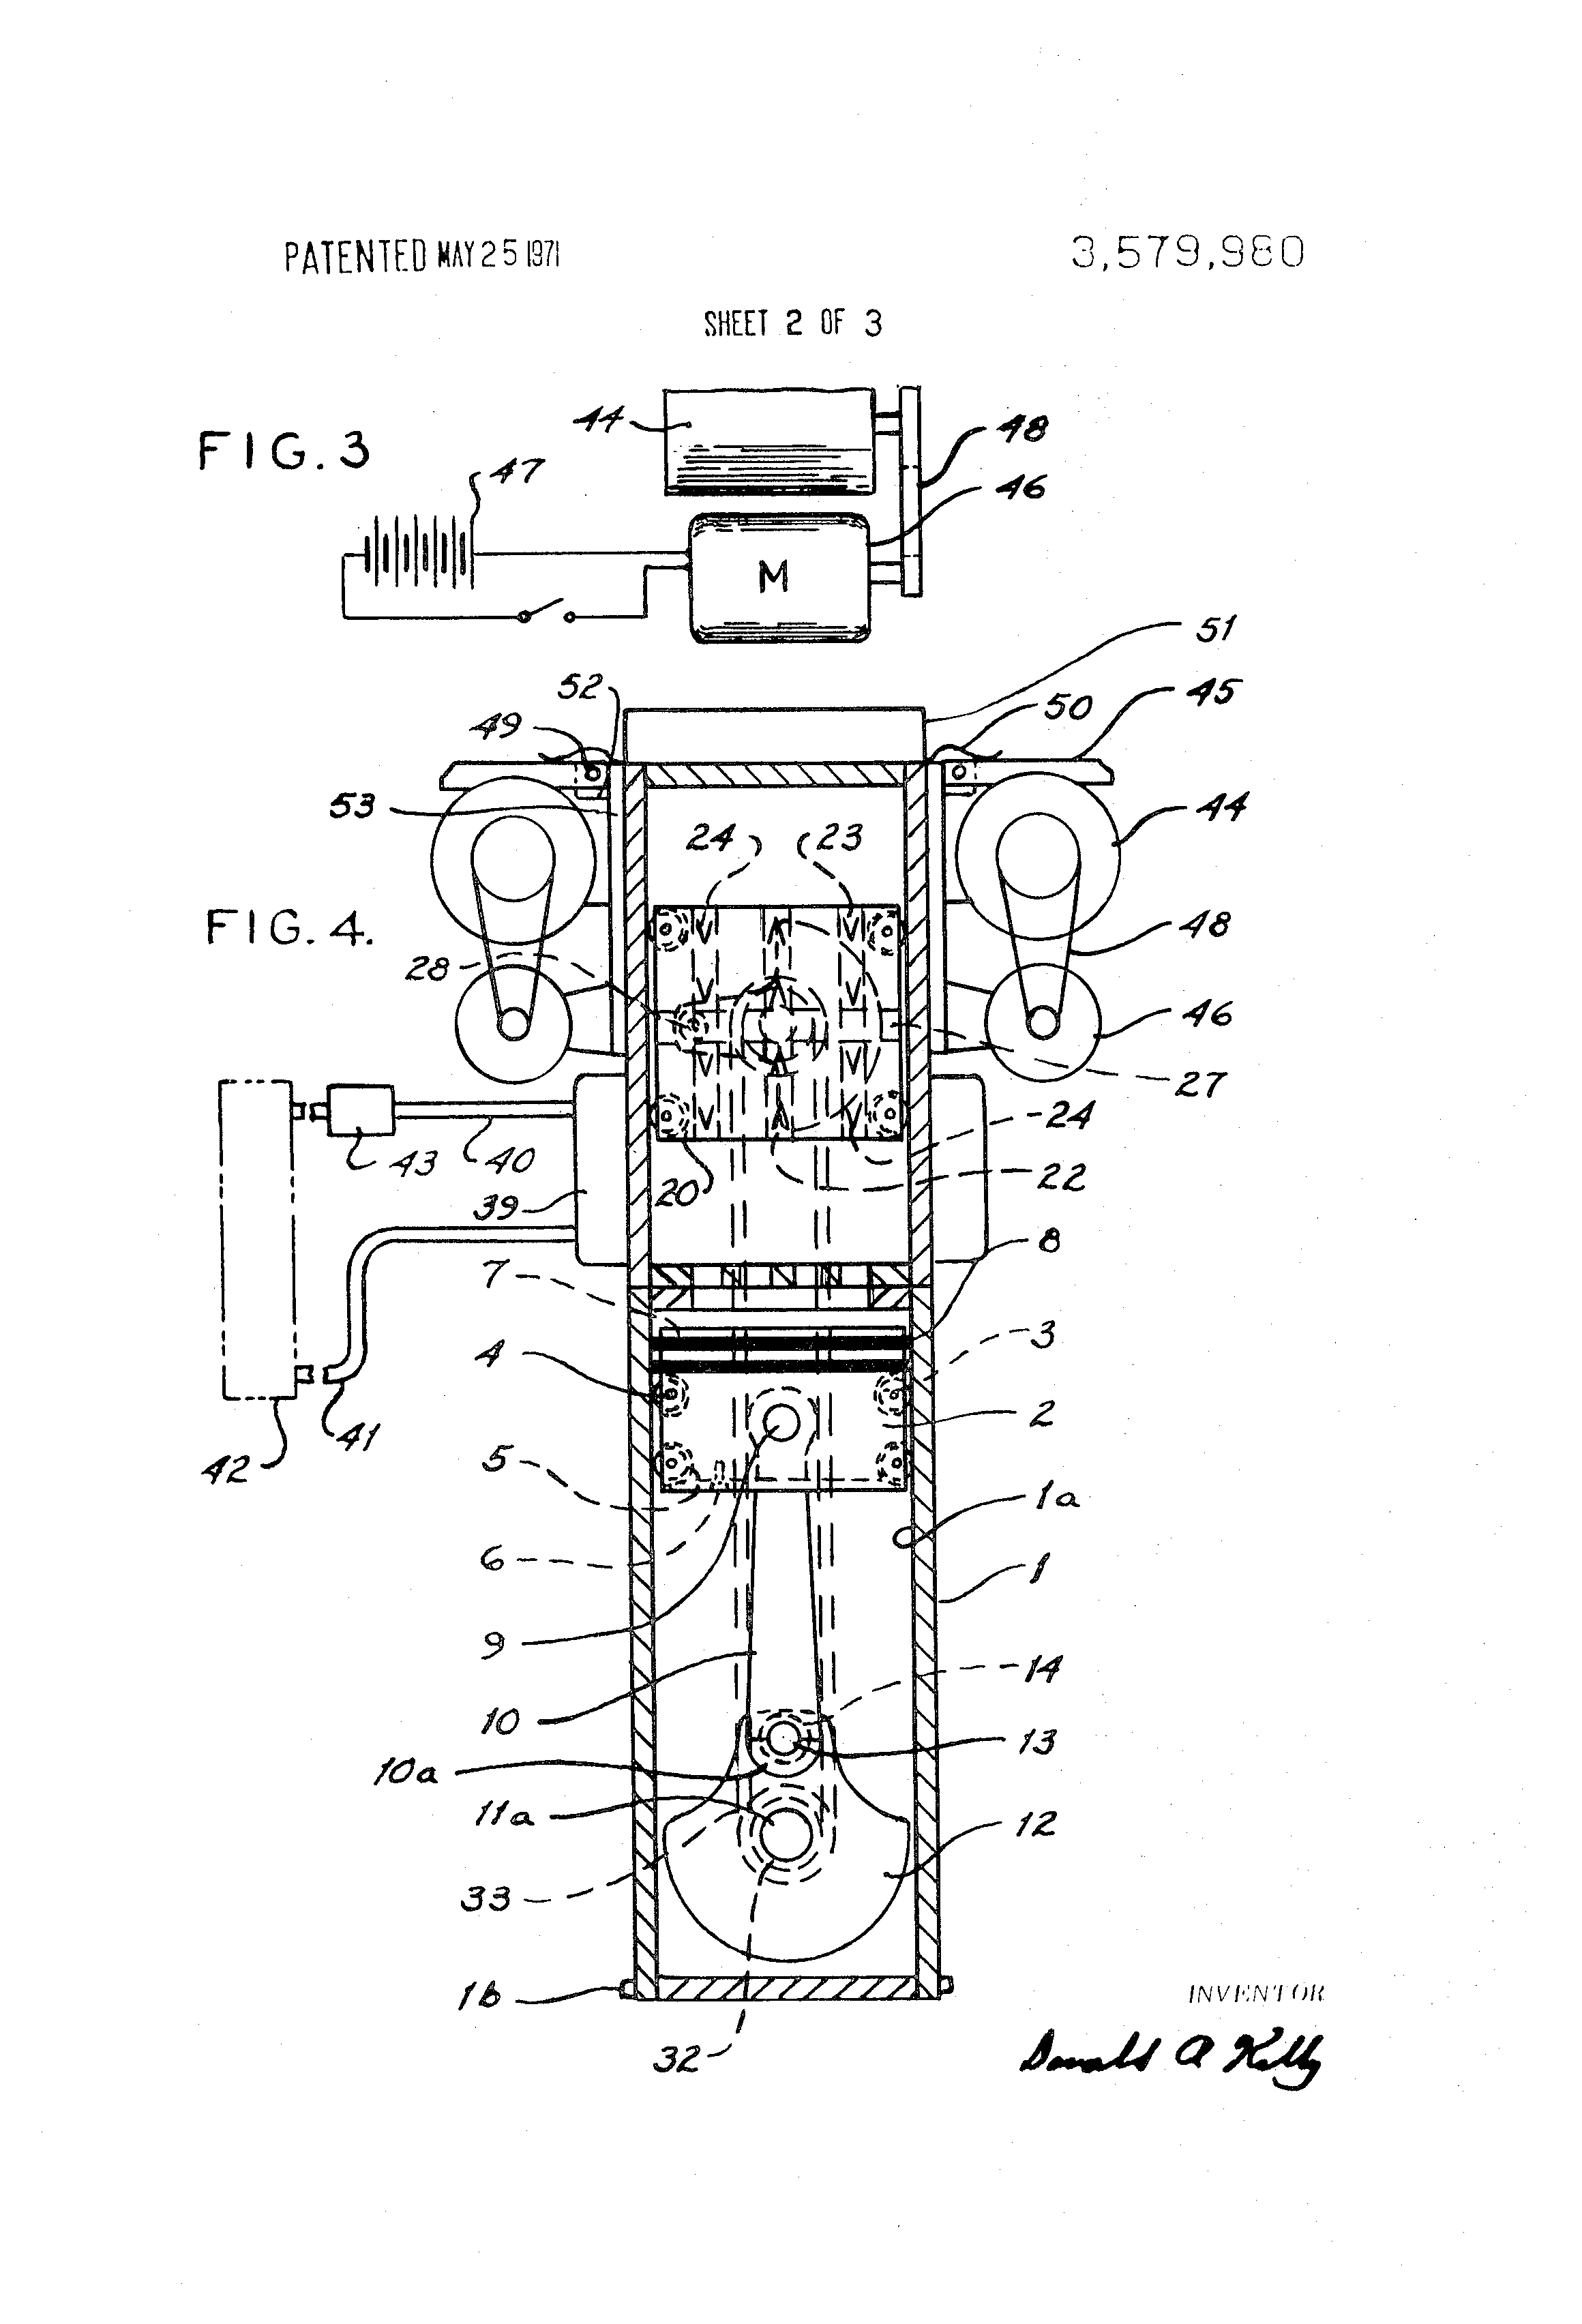 Brevet US3579980 - Uniflow stirling engine and frictional